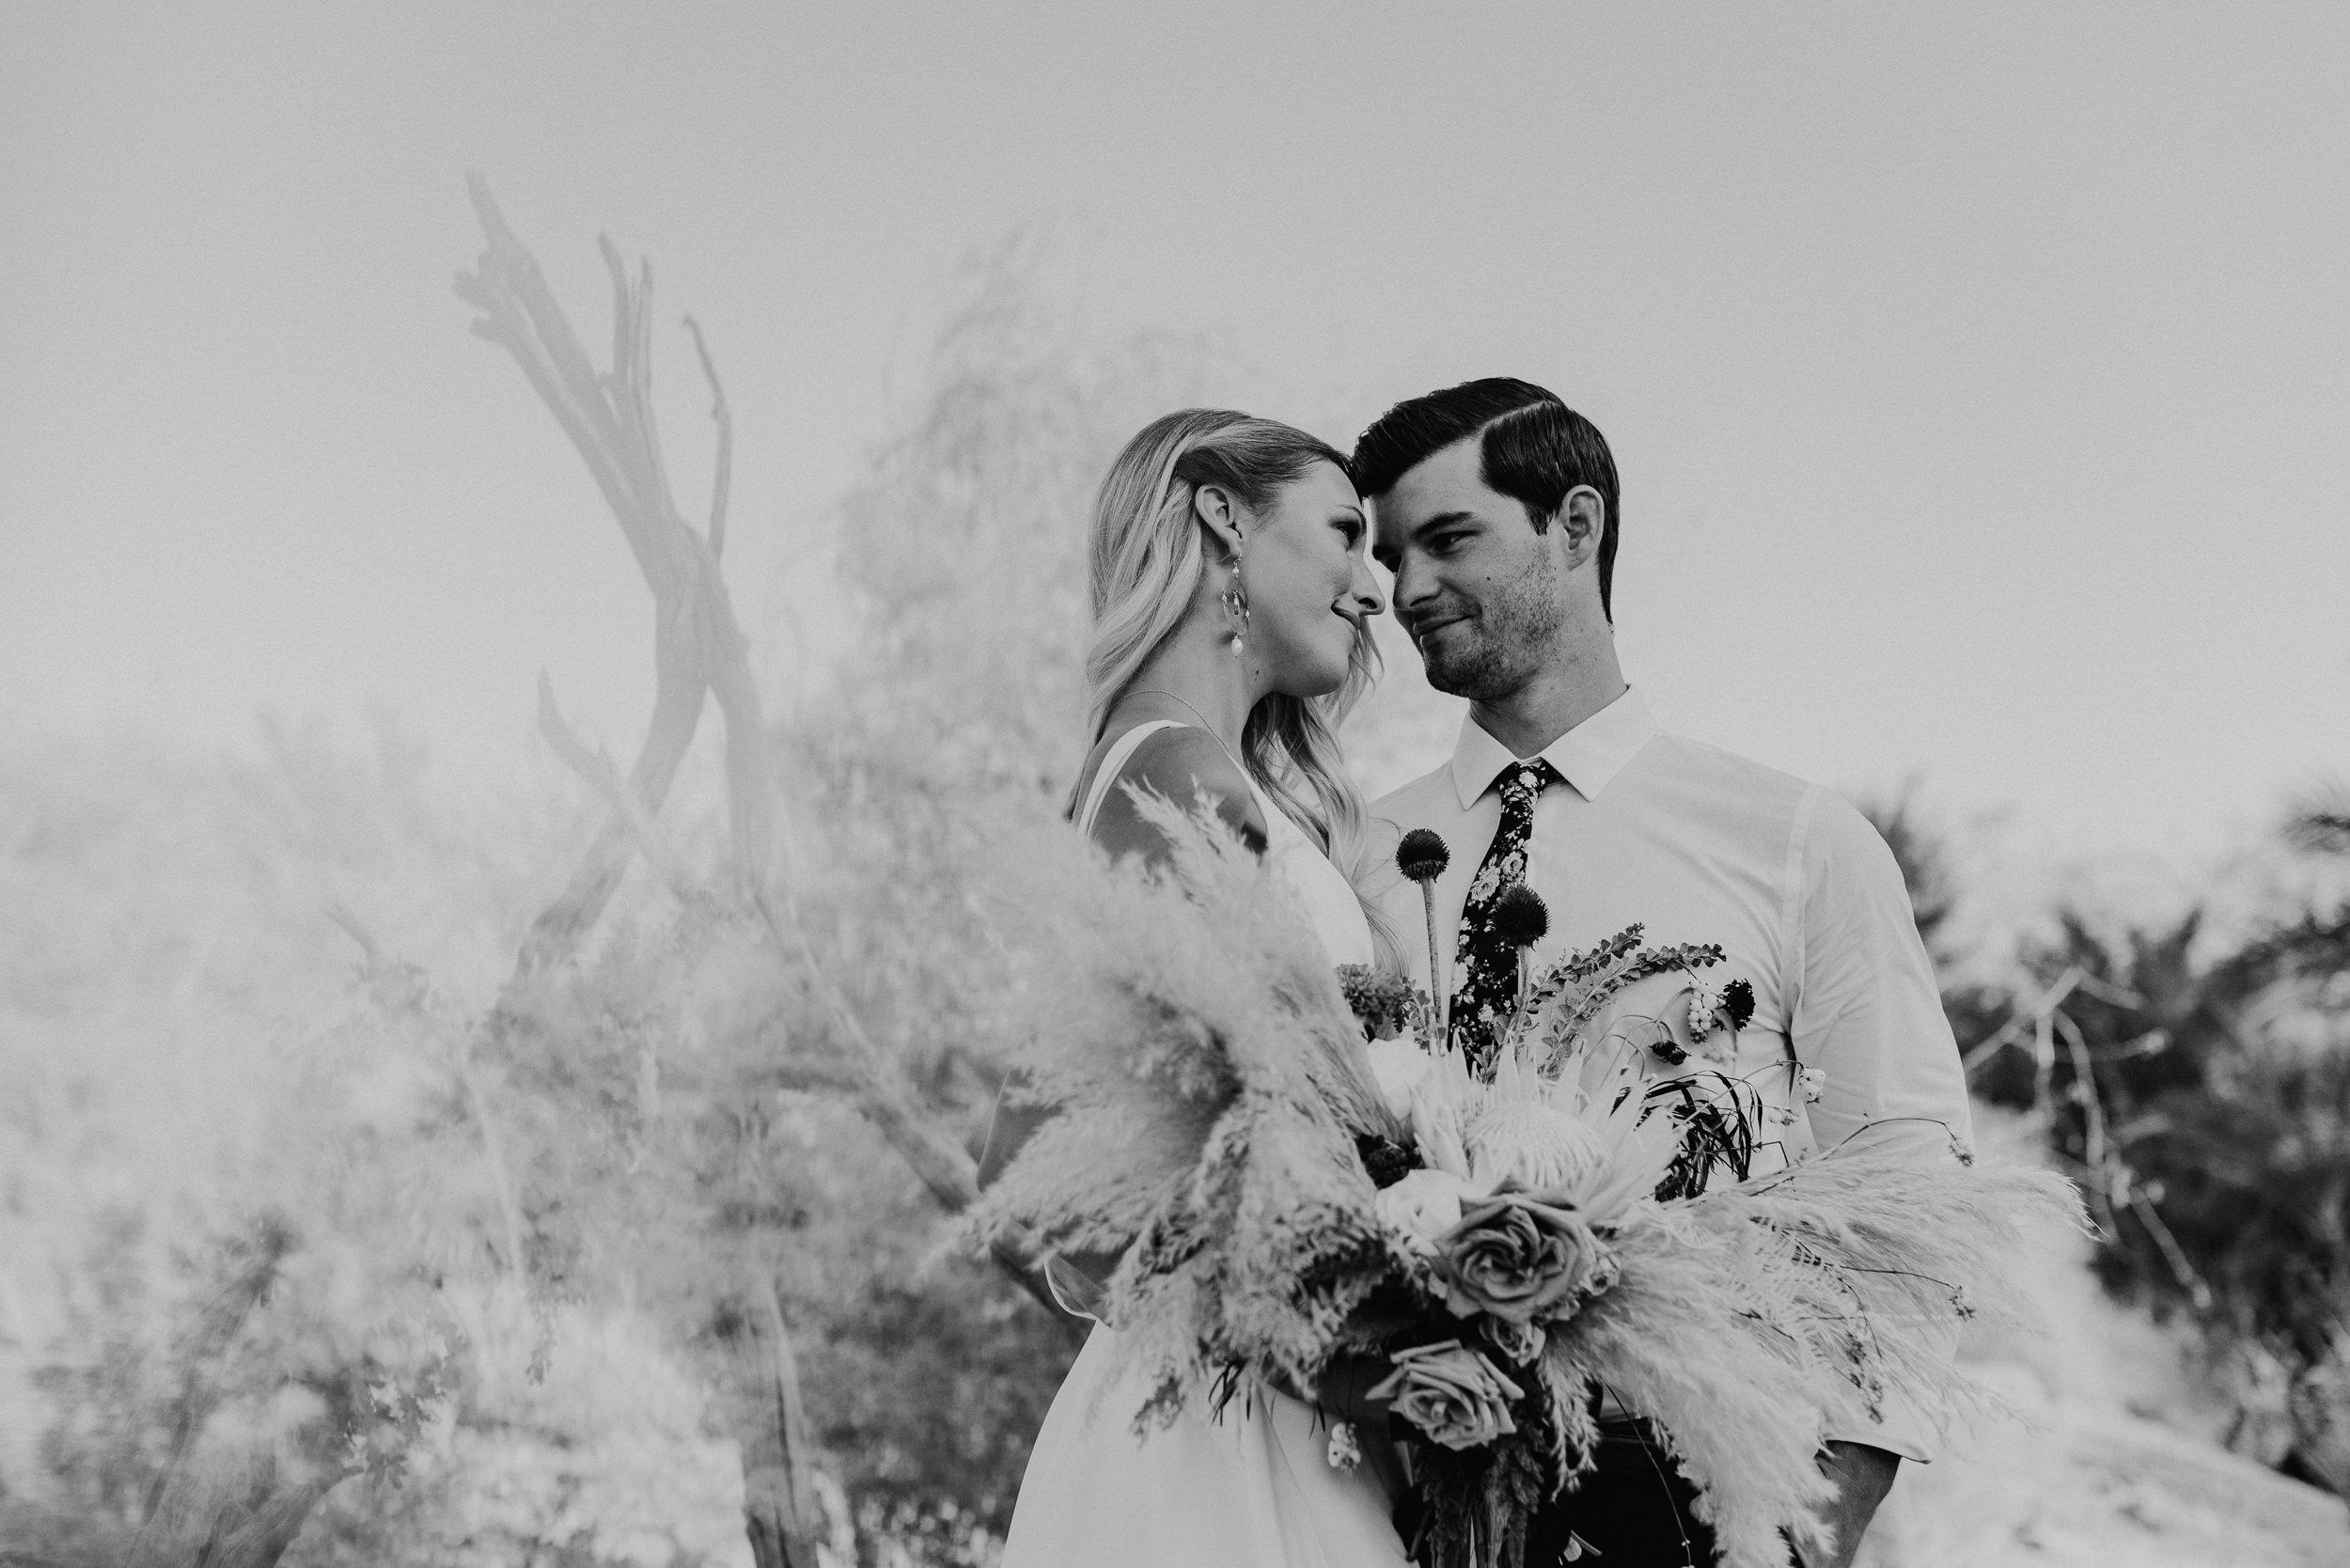 sChelsie + Chris - The Desert Shootout Wedding Romantics at The Living Desert-51.jpg